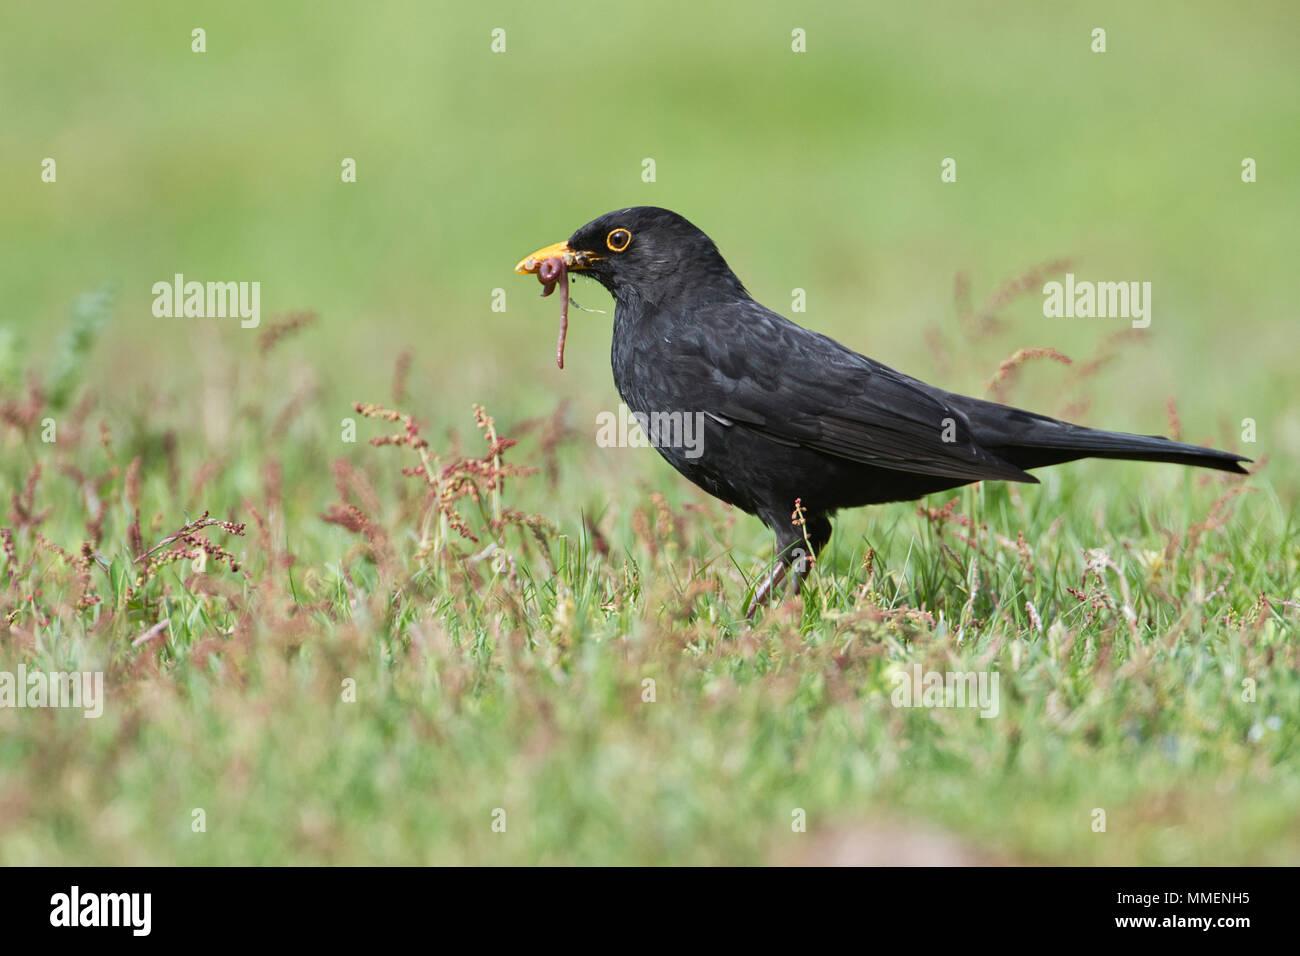 Male blackbird (Turdus merula) gathering invertebrate food for chicks - Stock Image